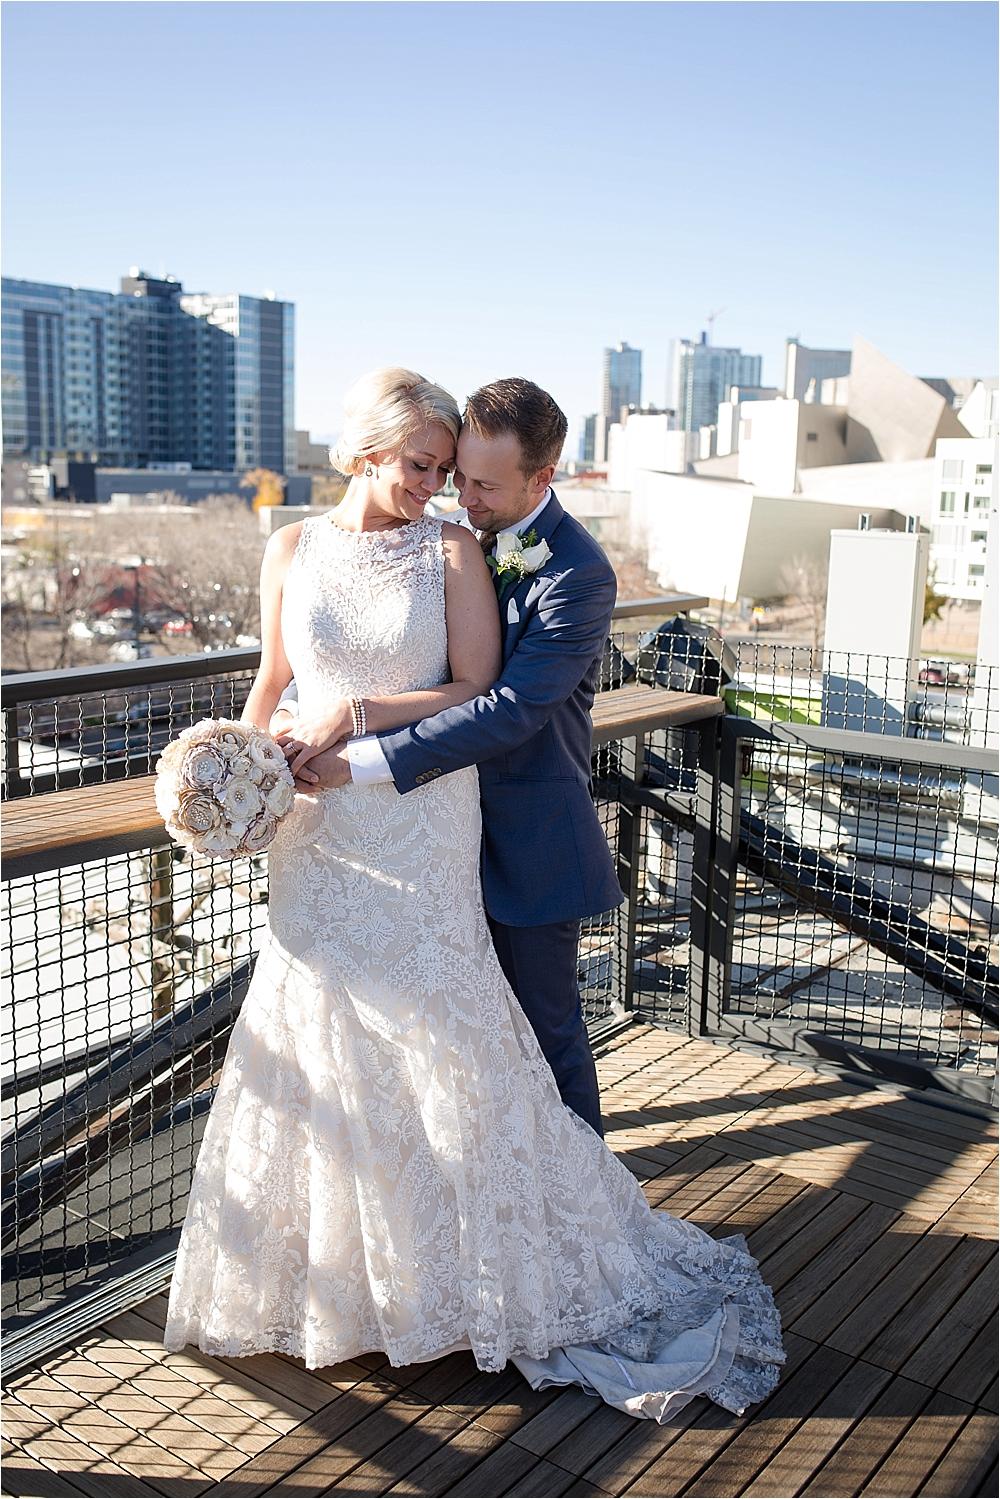 Trina + Elliott's Downtown Denver Wedding_0045.jpg